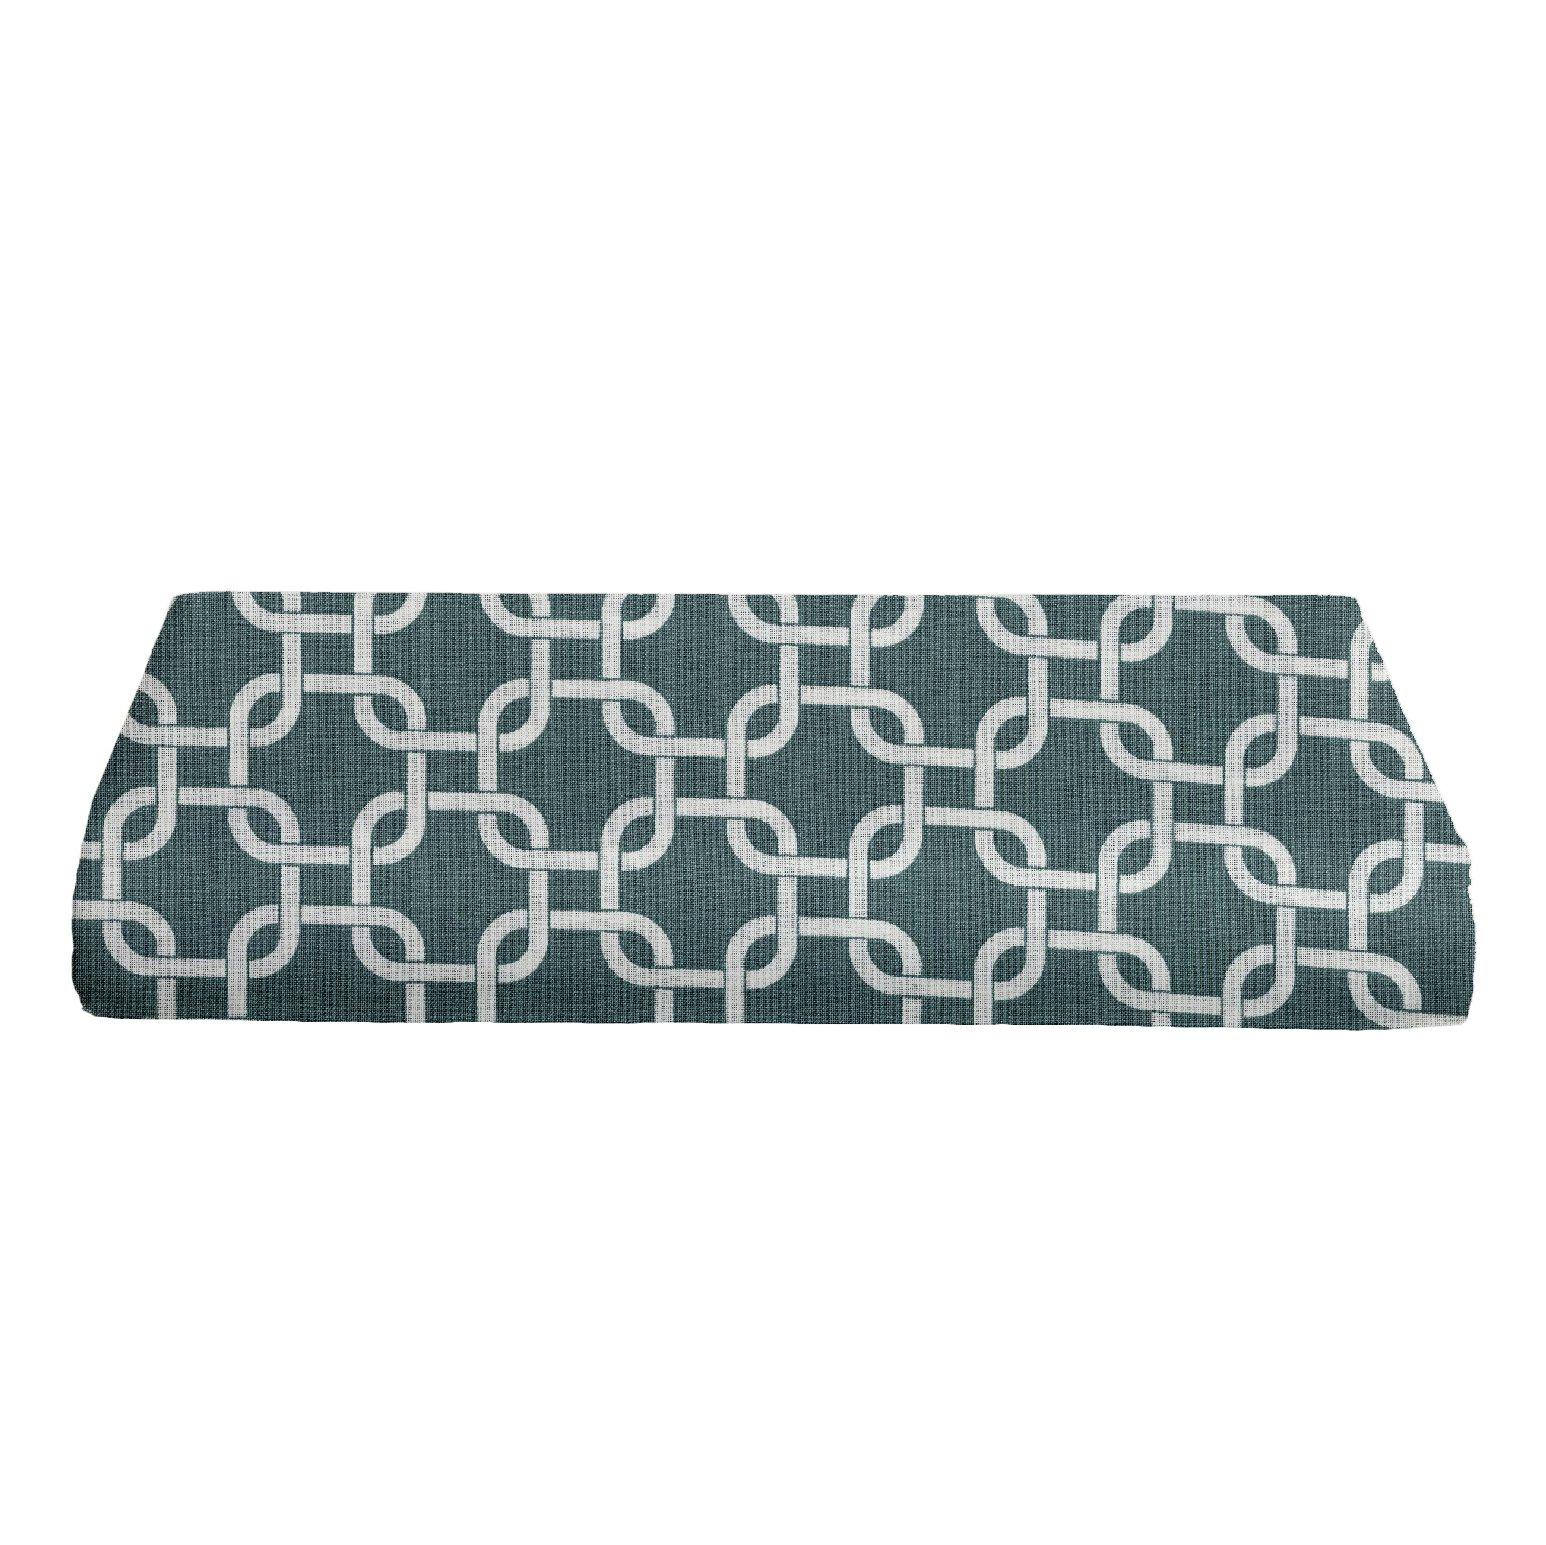 BKB Cradle Sheet RopeSheet Rope Links, Spa Blue, 18'' x 36''